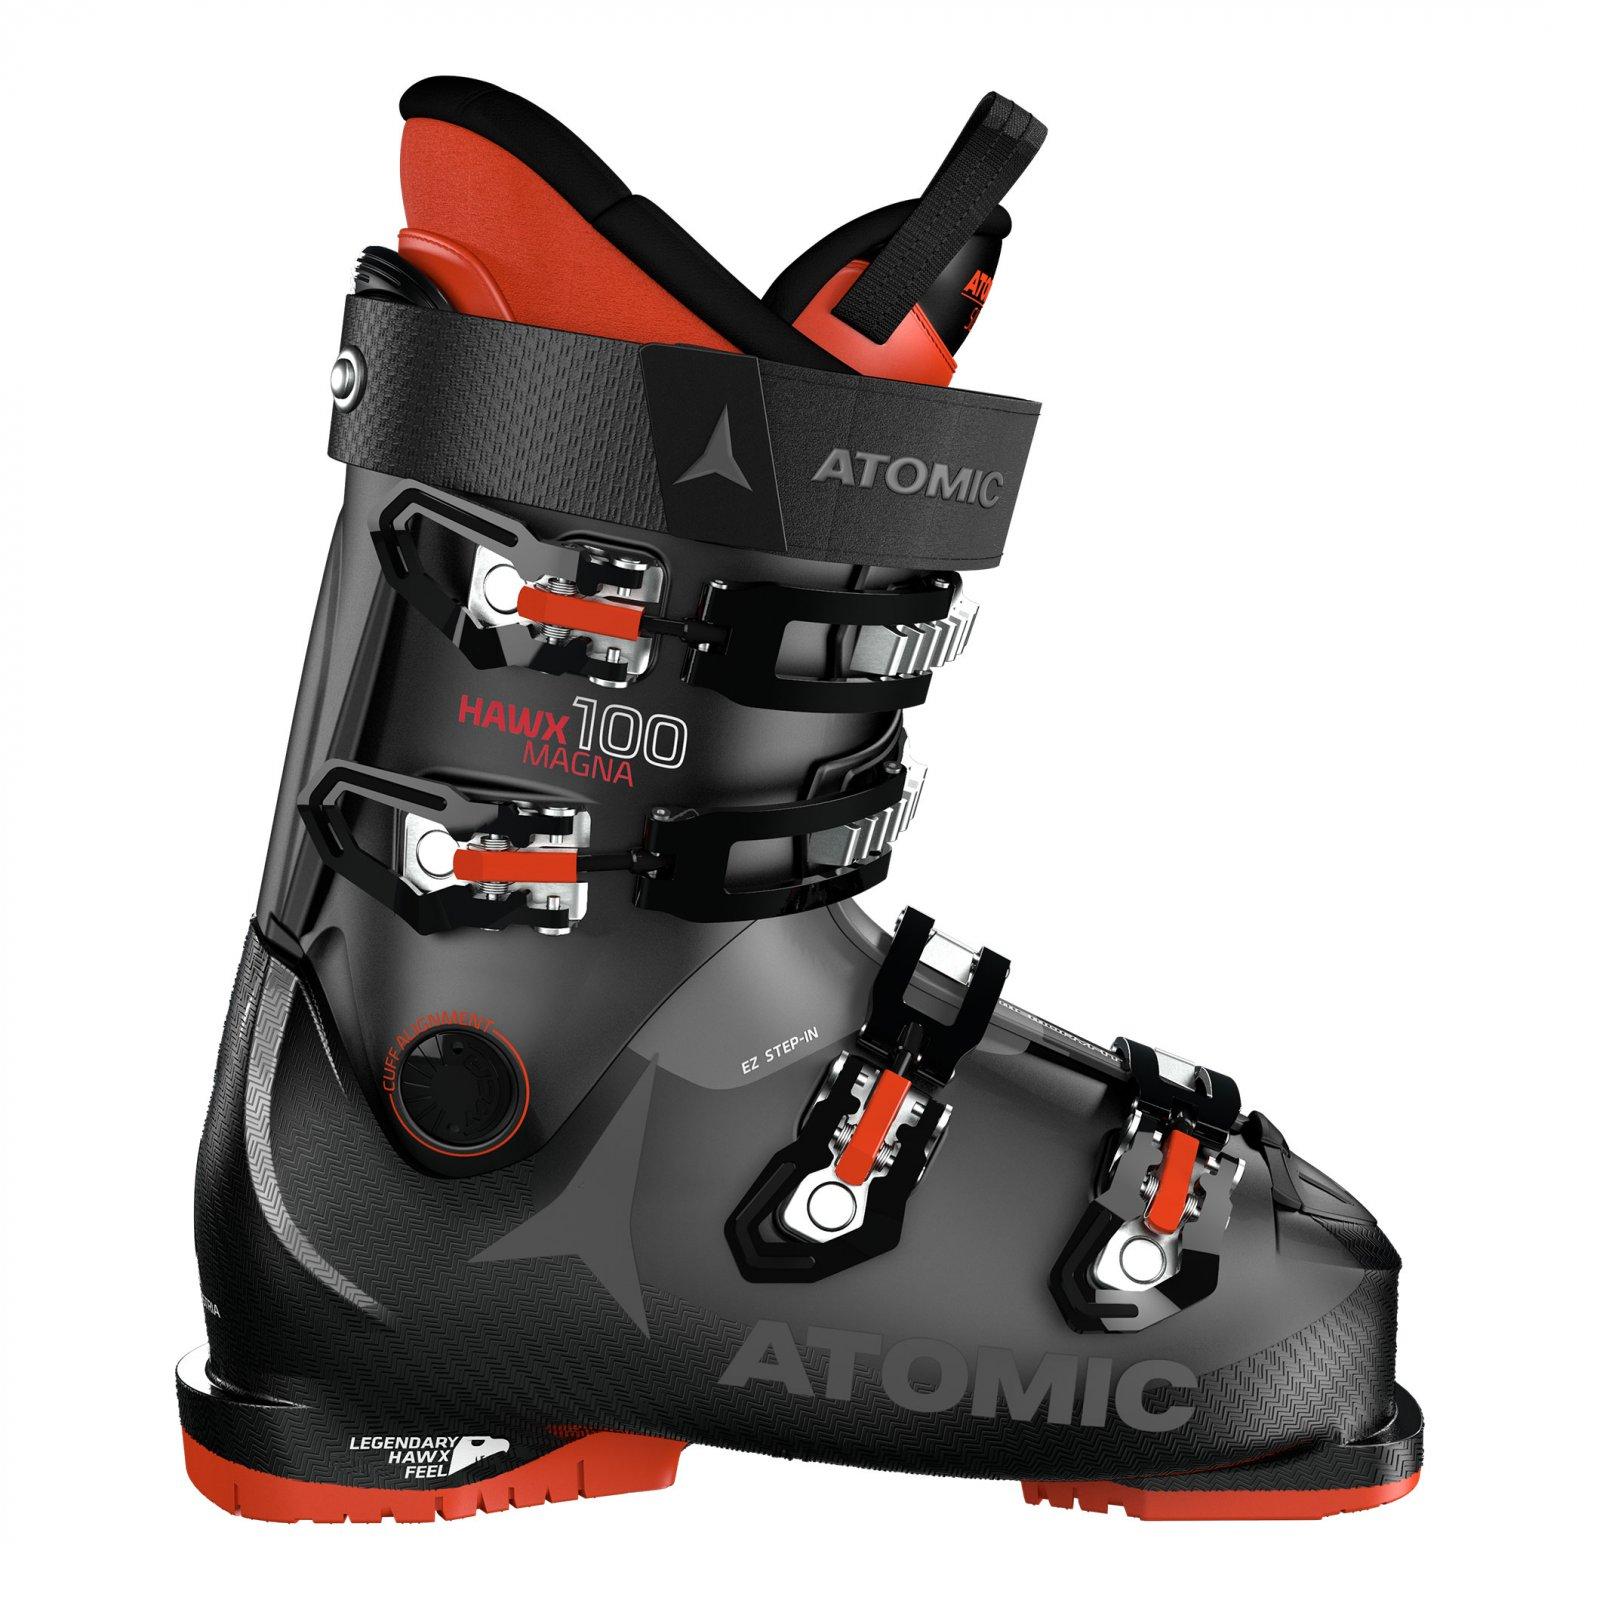 2021 Atomic Hawx Magna 100 Men's Ski Boots